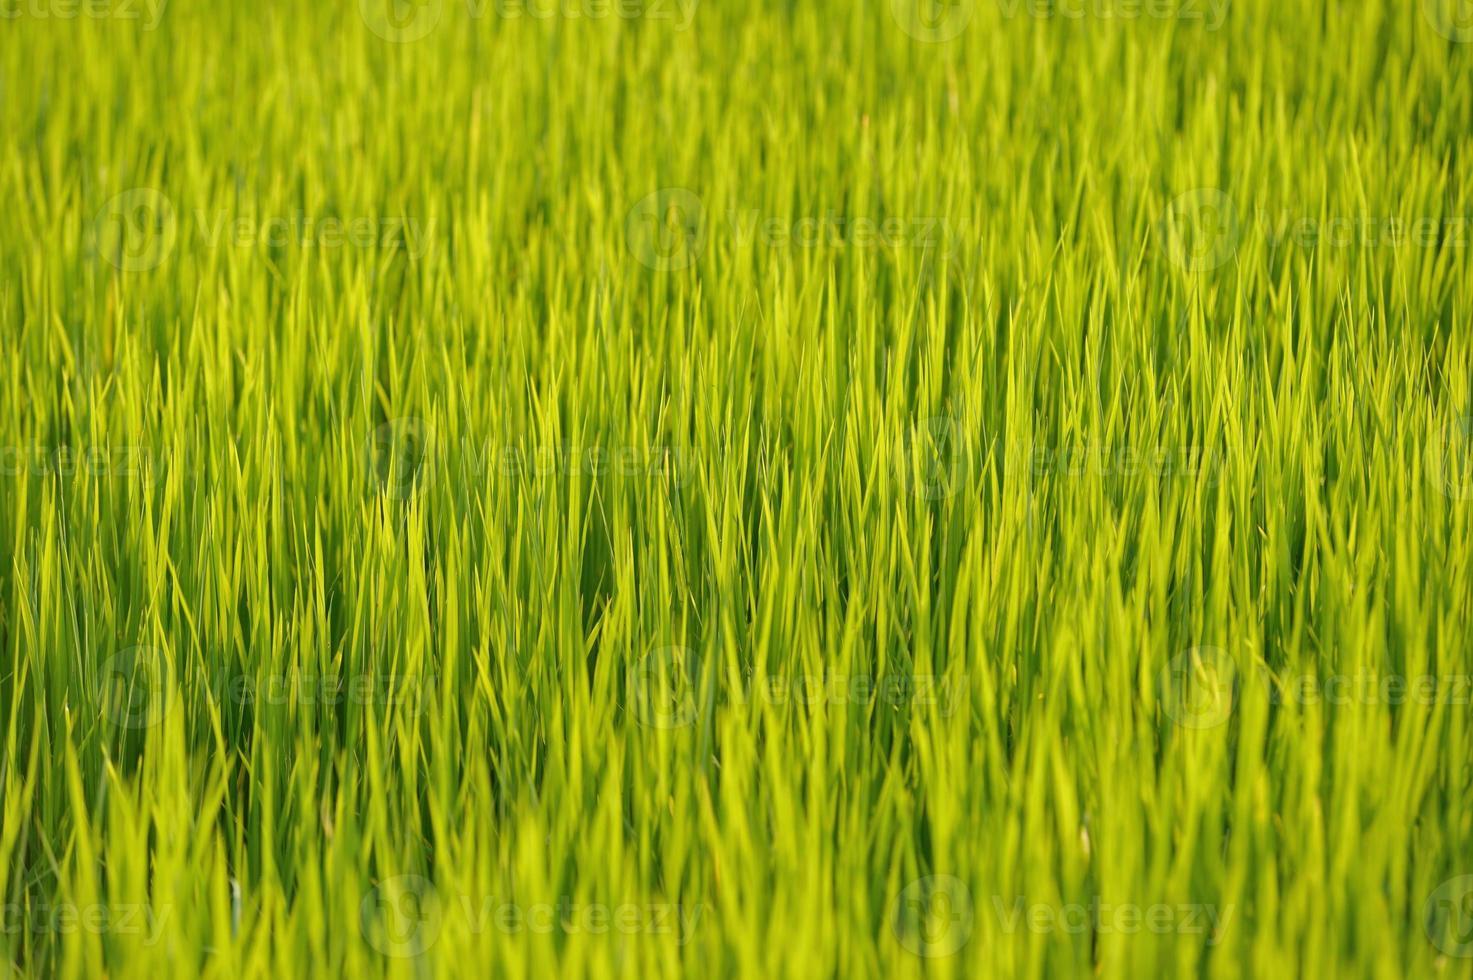 grönt ris foto